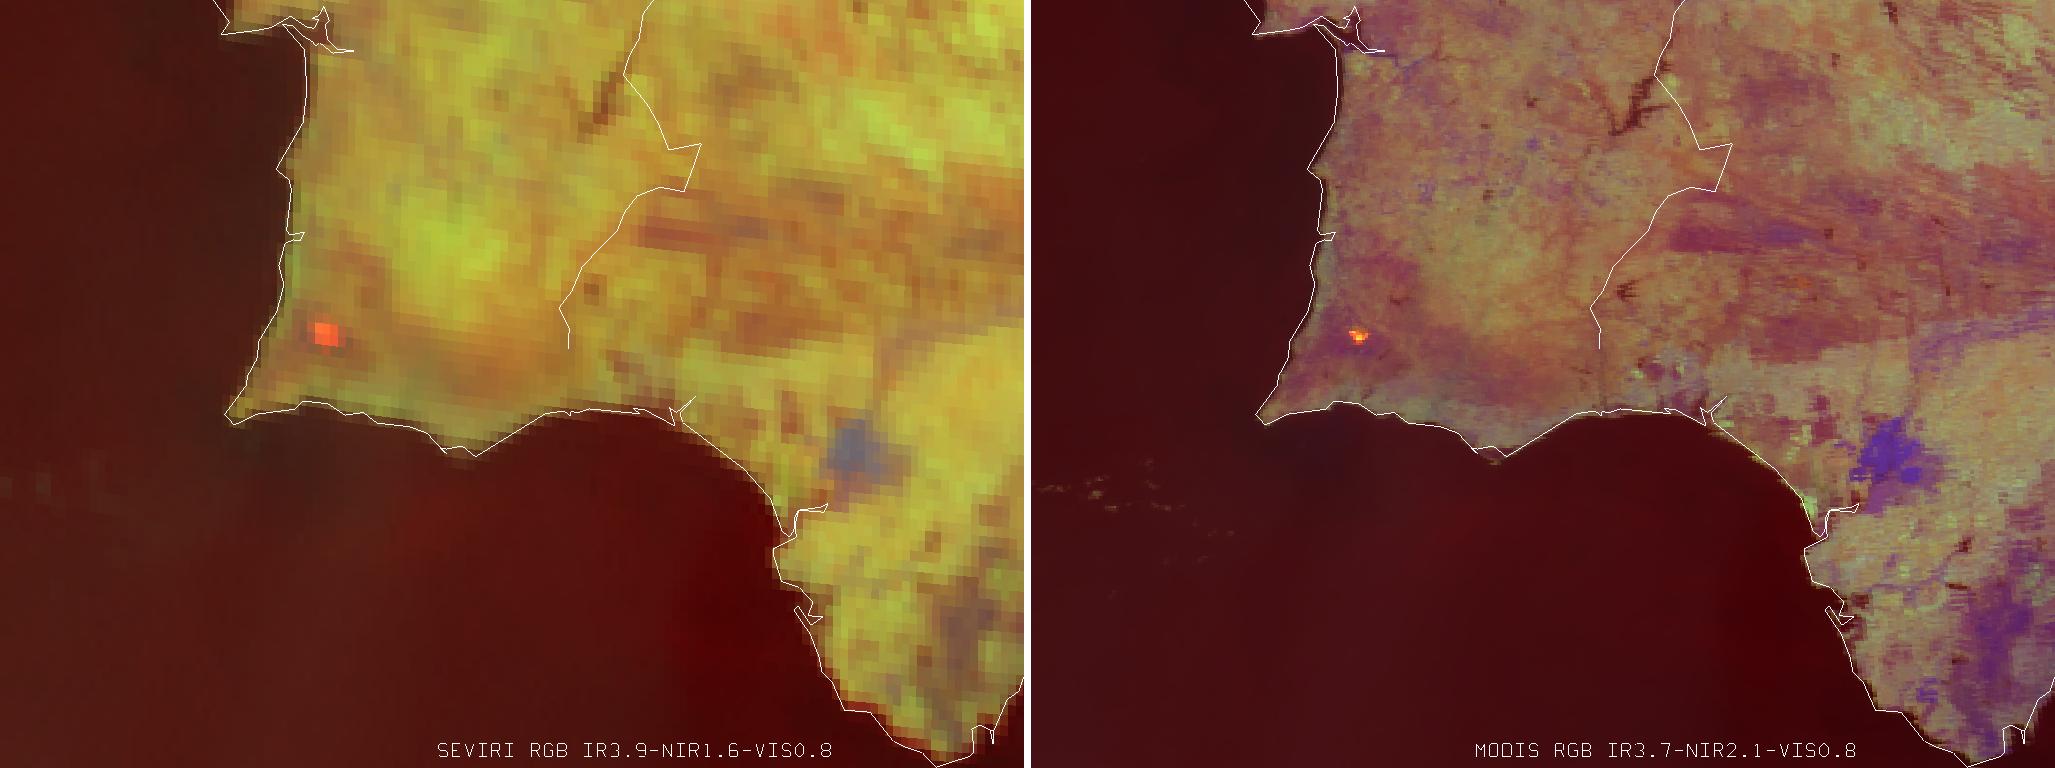 MTG example SEVIRI v MODIS Fire (Portugal)